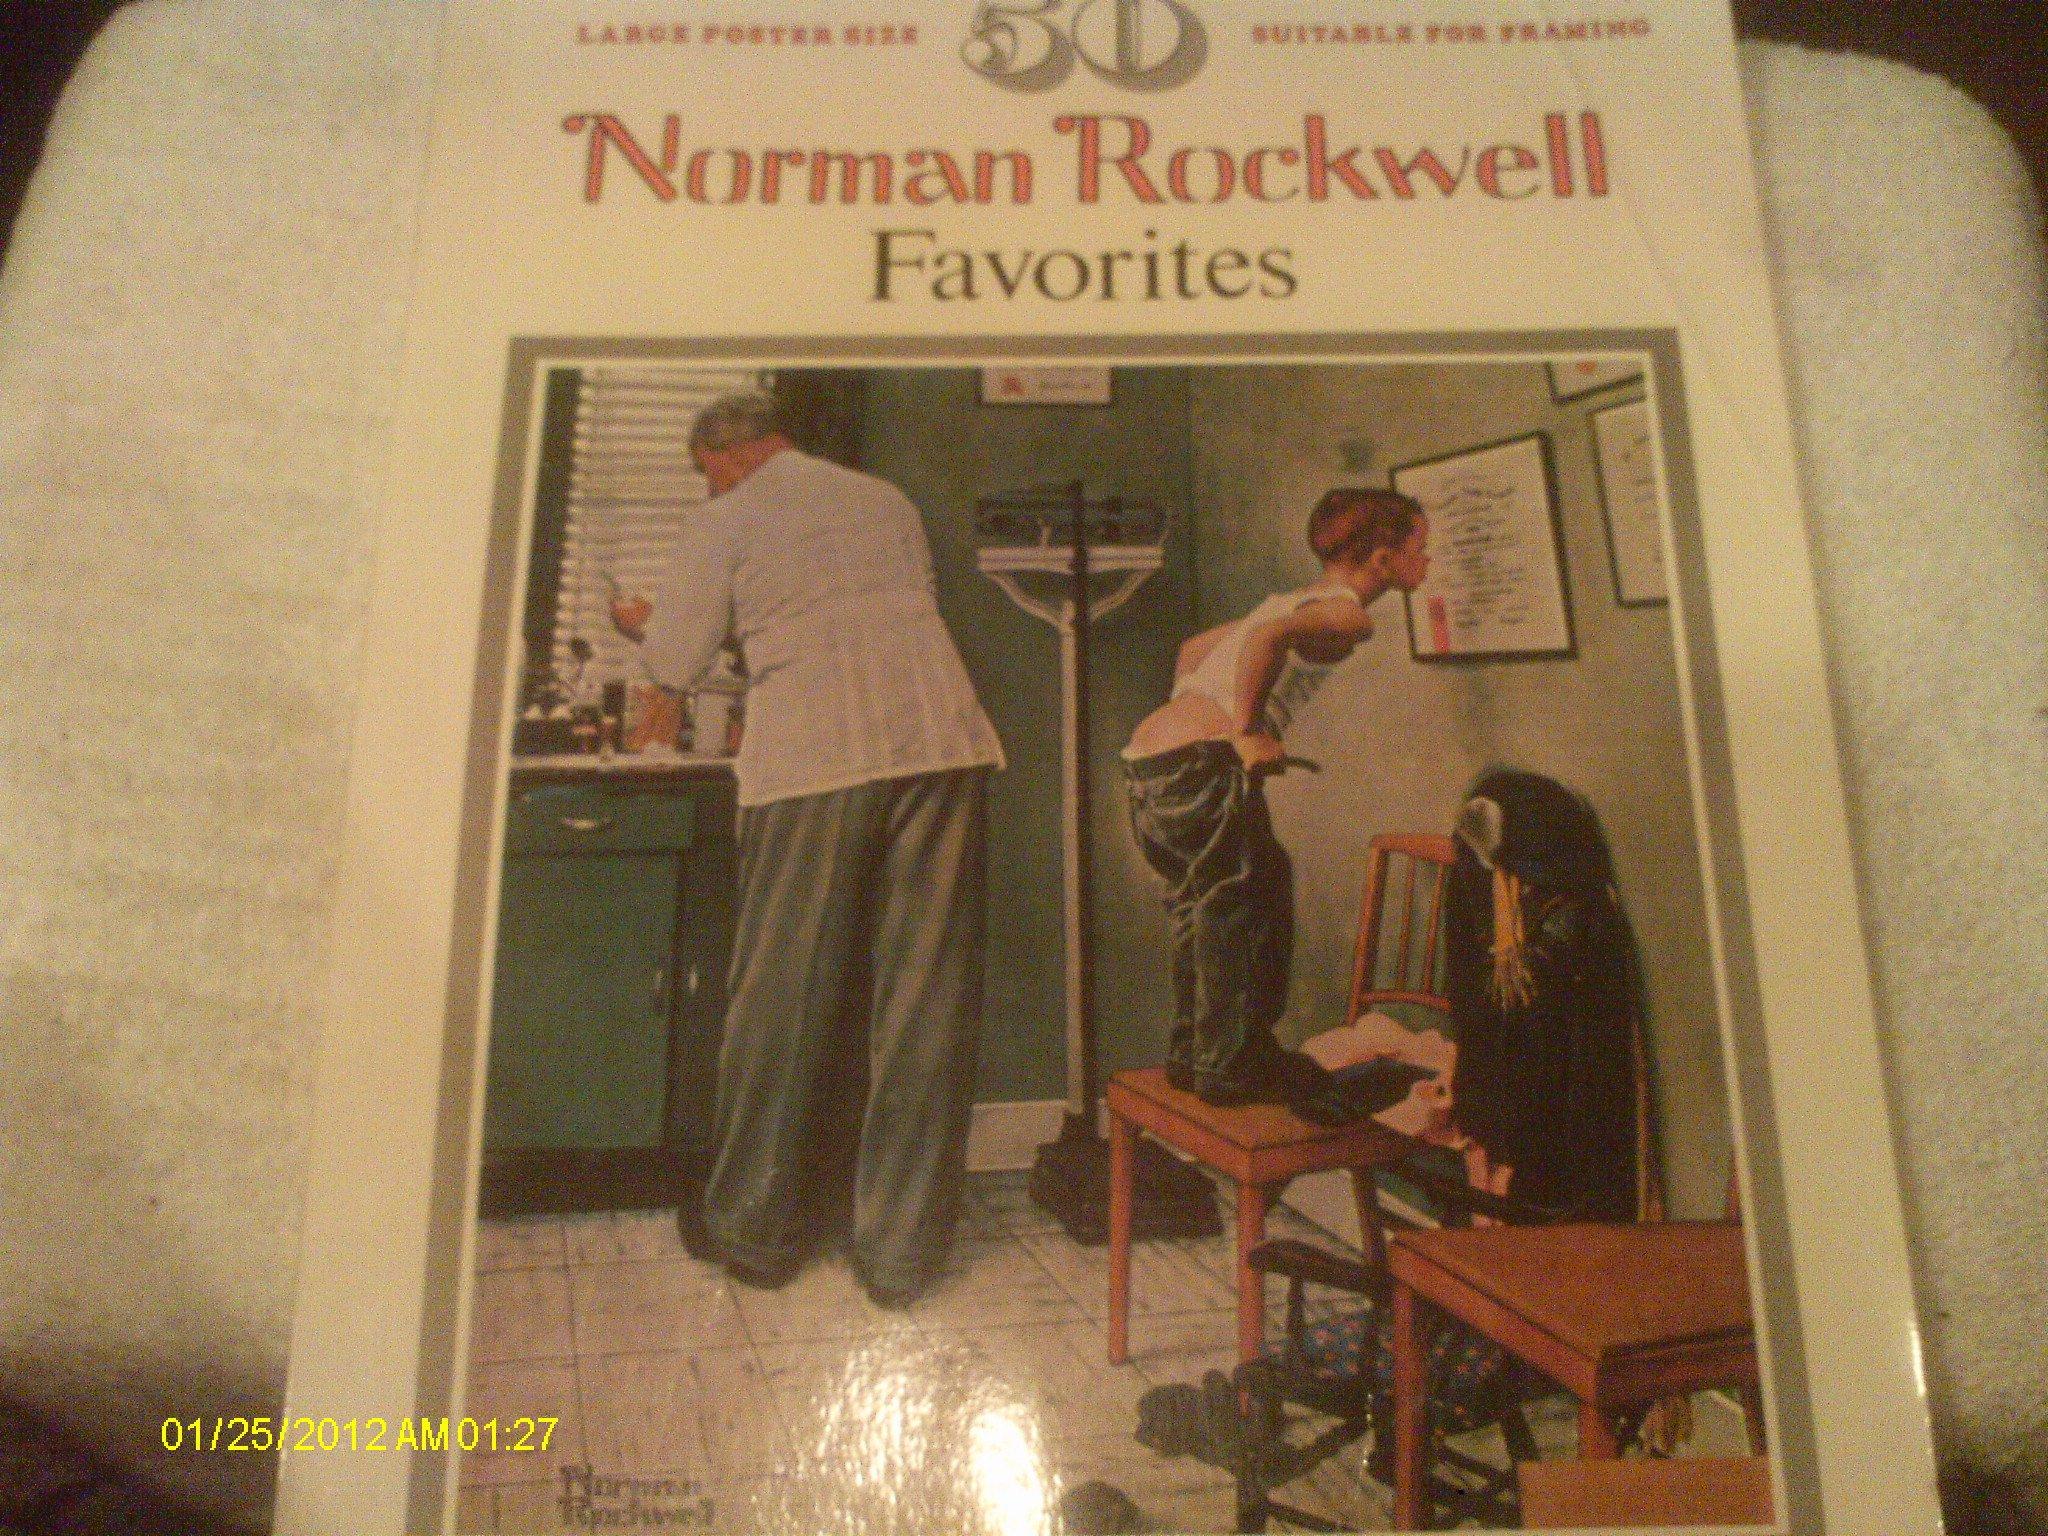 Norman Rockwell Iphone Wallpaper 14941 Pixhd